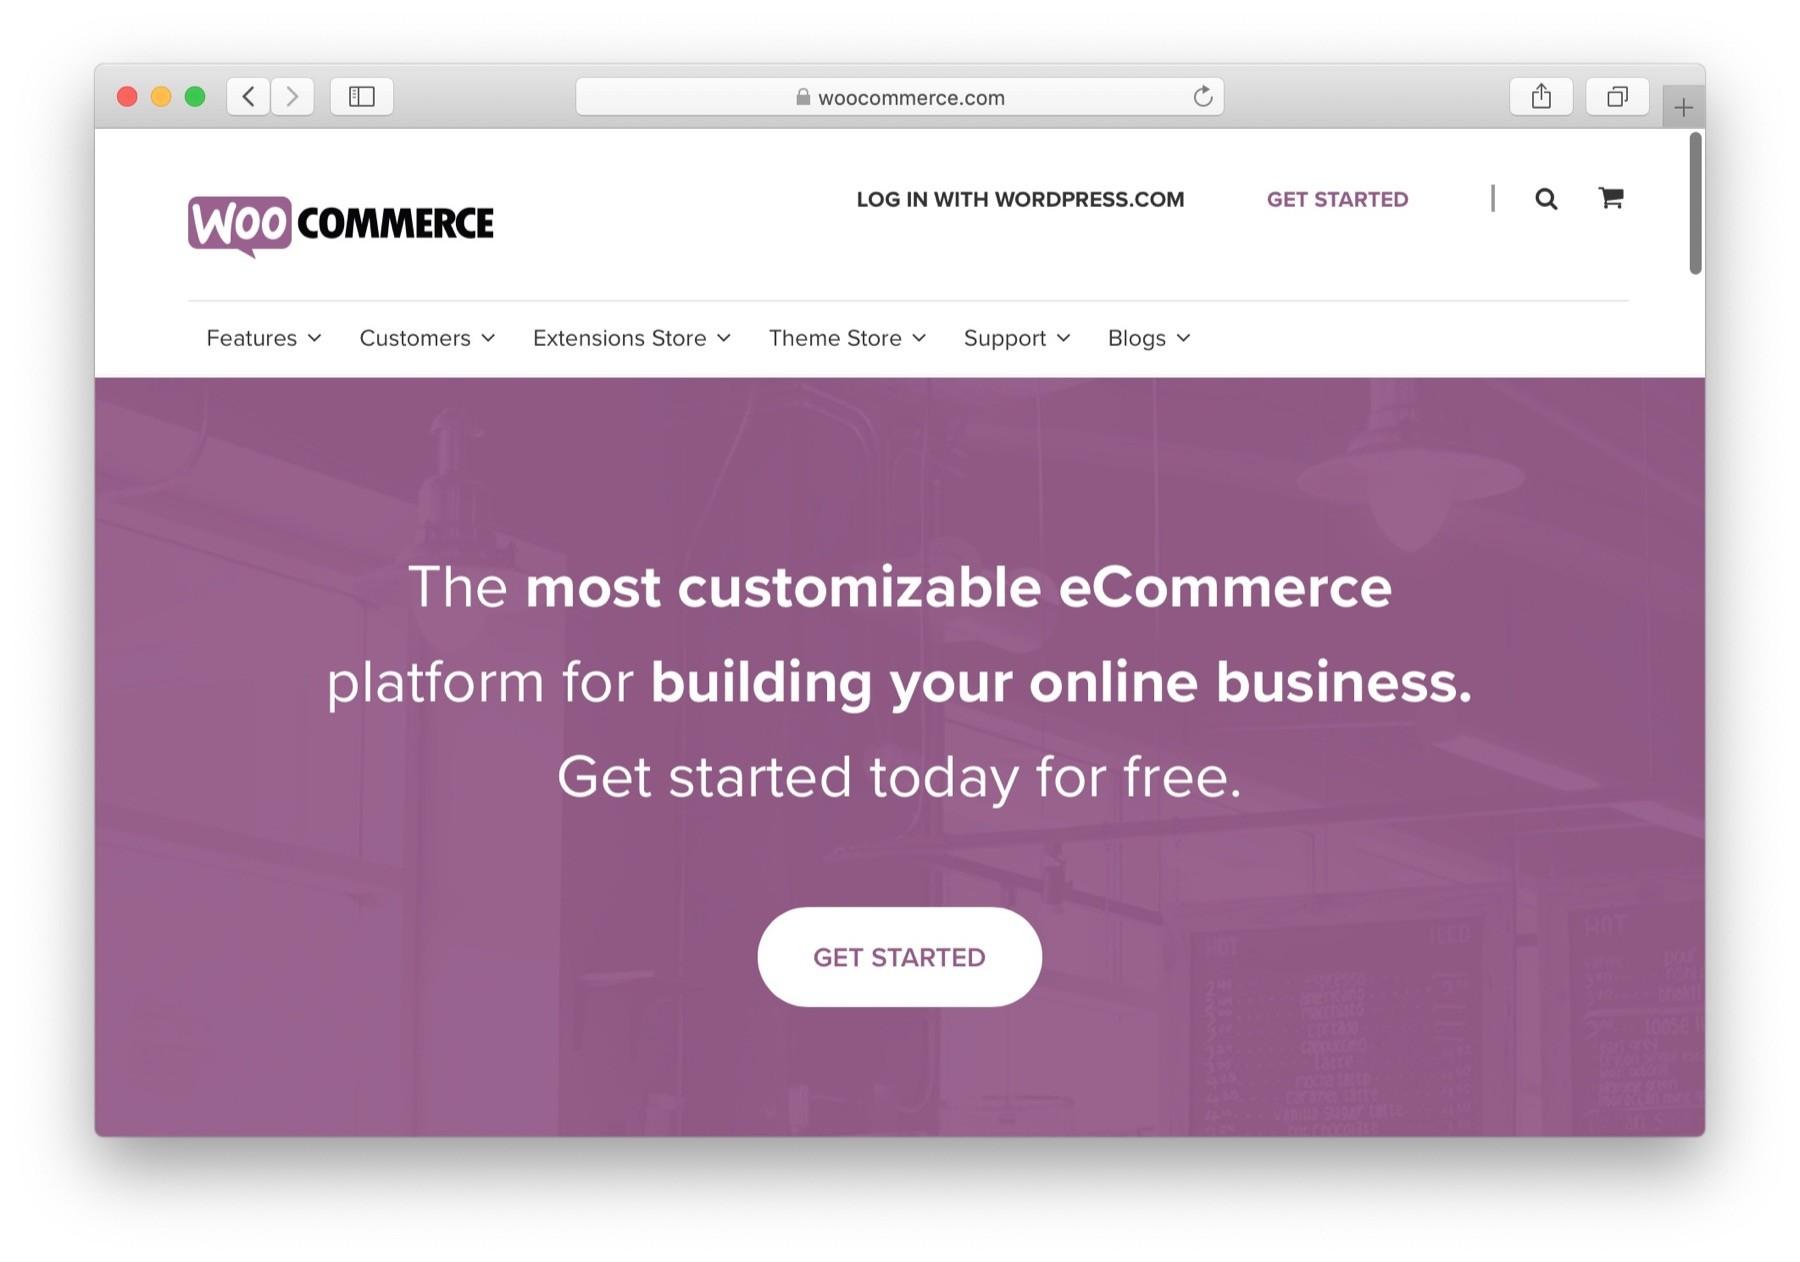 woocommerce-开展电子商务业务的绝佳平台